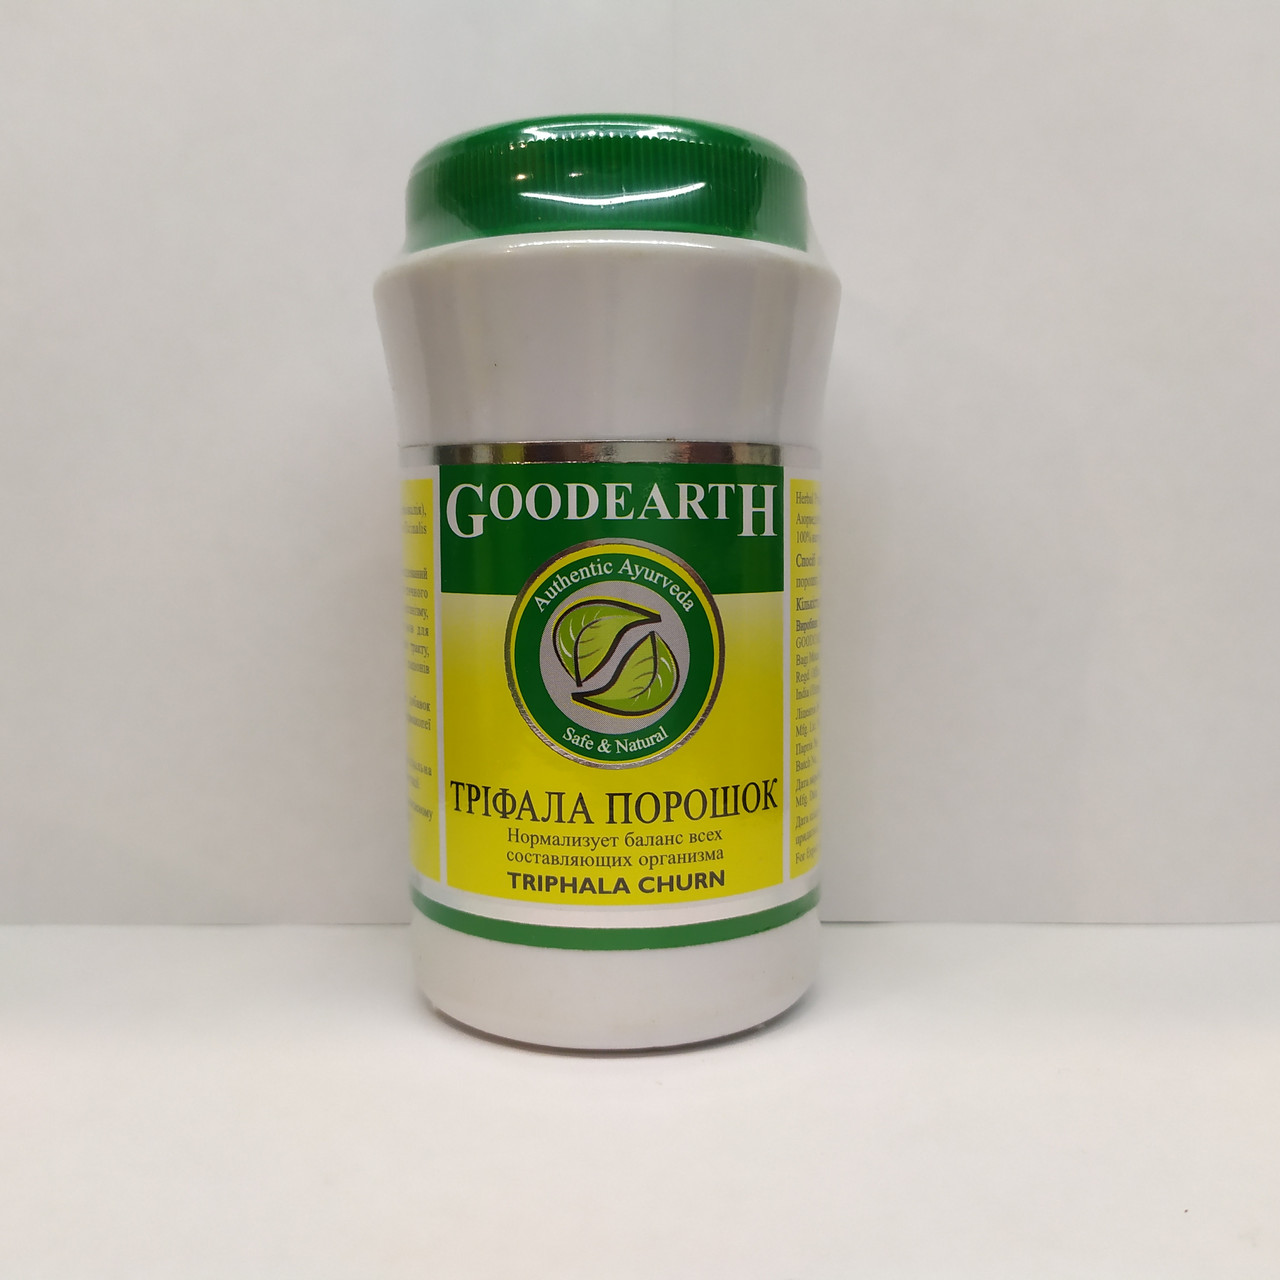 Трифала порошок (120 г) Goodcare Pharma, цена 120 грн., купить в Запорожье  — Prom.ua (ID#1044260839)